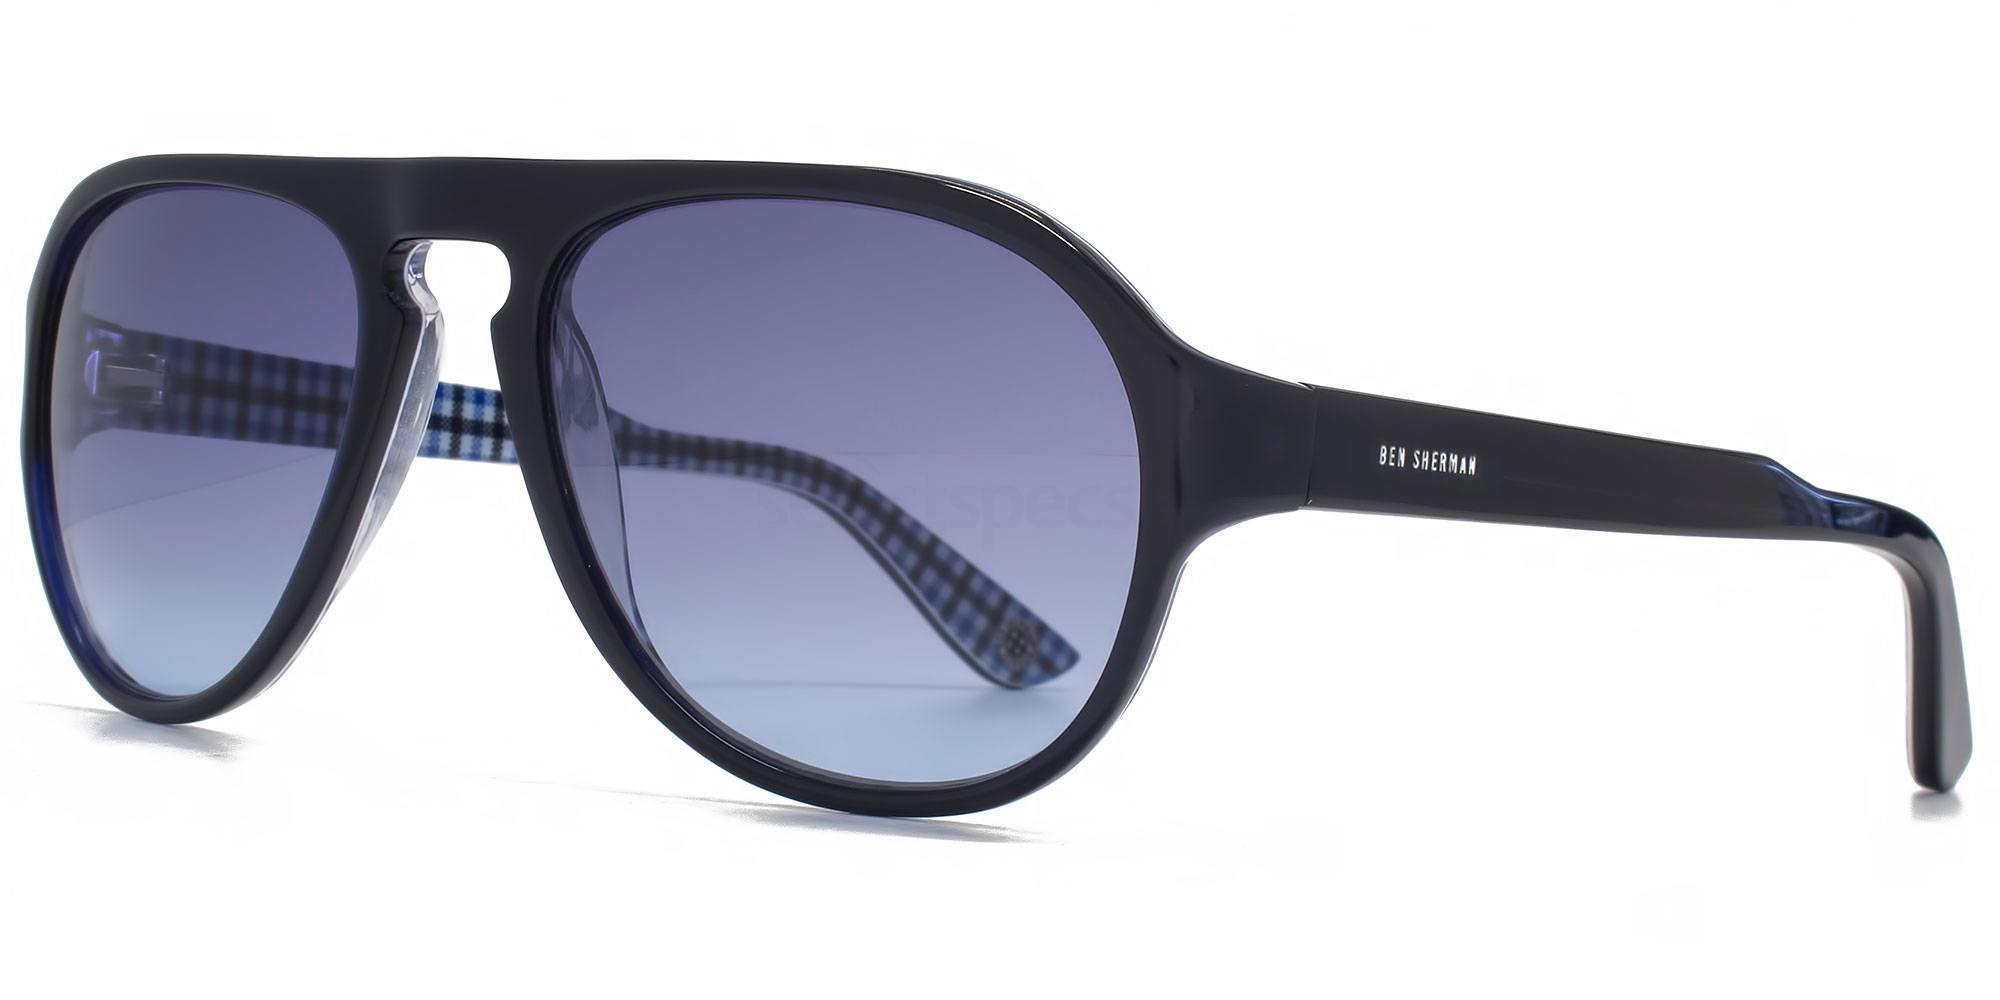 NVY BENP003 - ROBERT Sunglasses, Ben Sherman